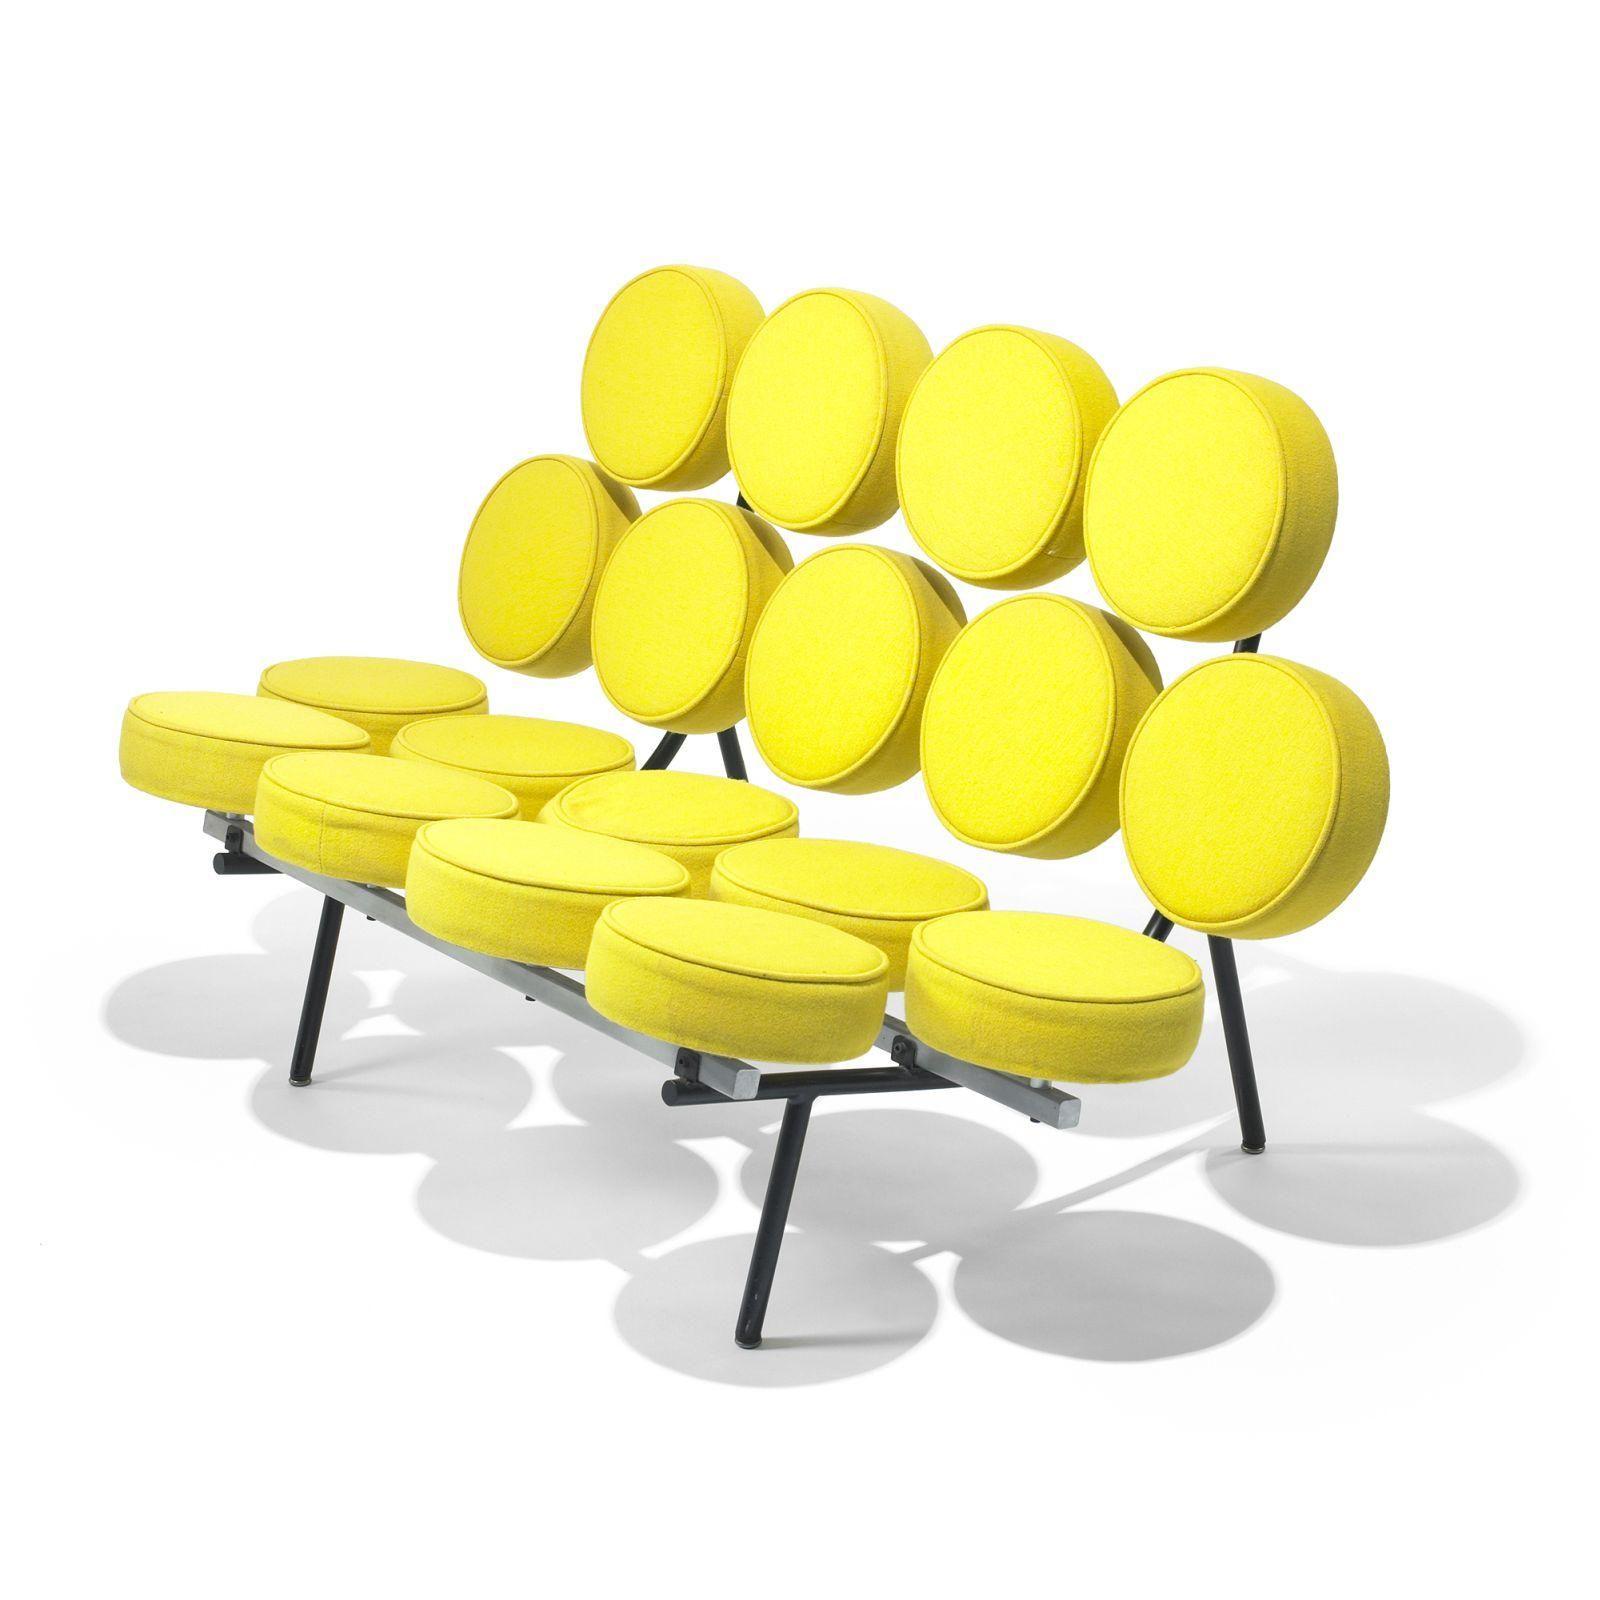 "George Nelson & Associates Marshmallow sofa model 5670 ""LOVE it in"